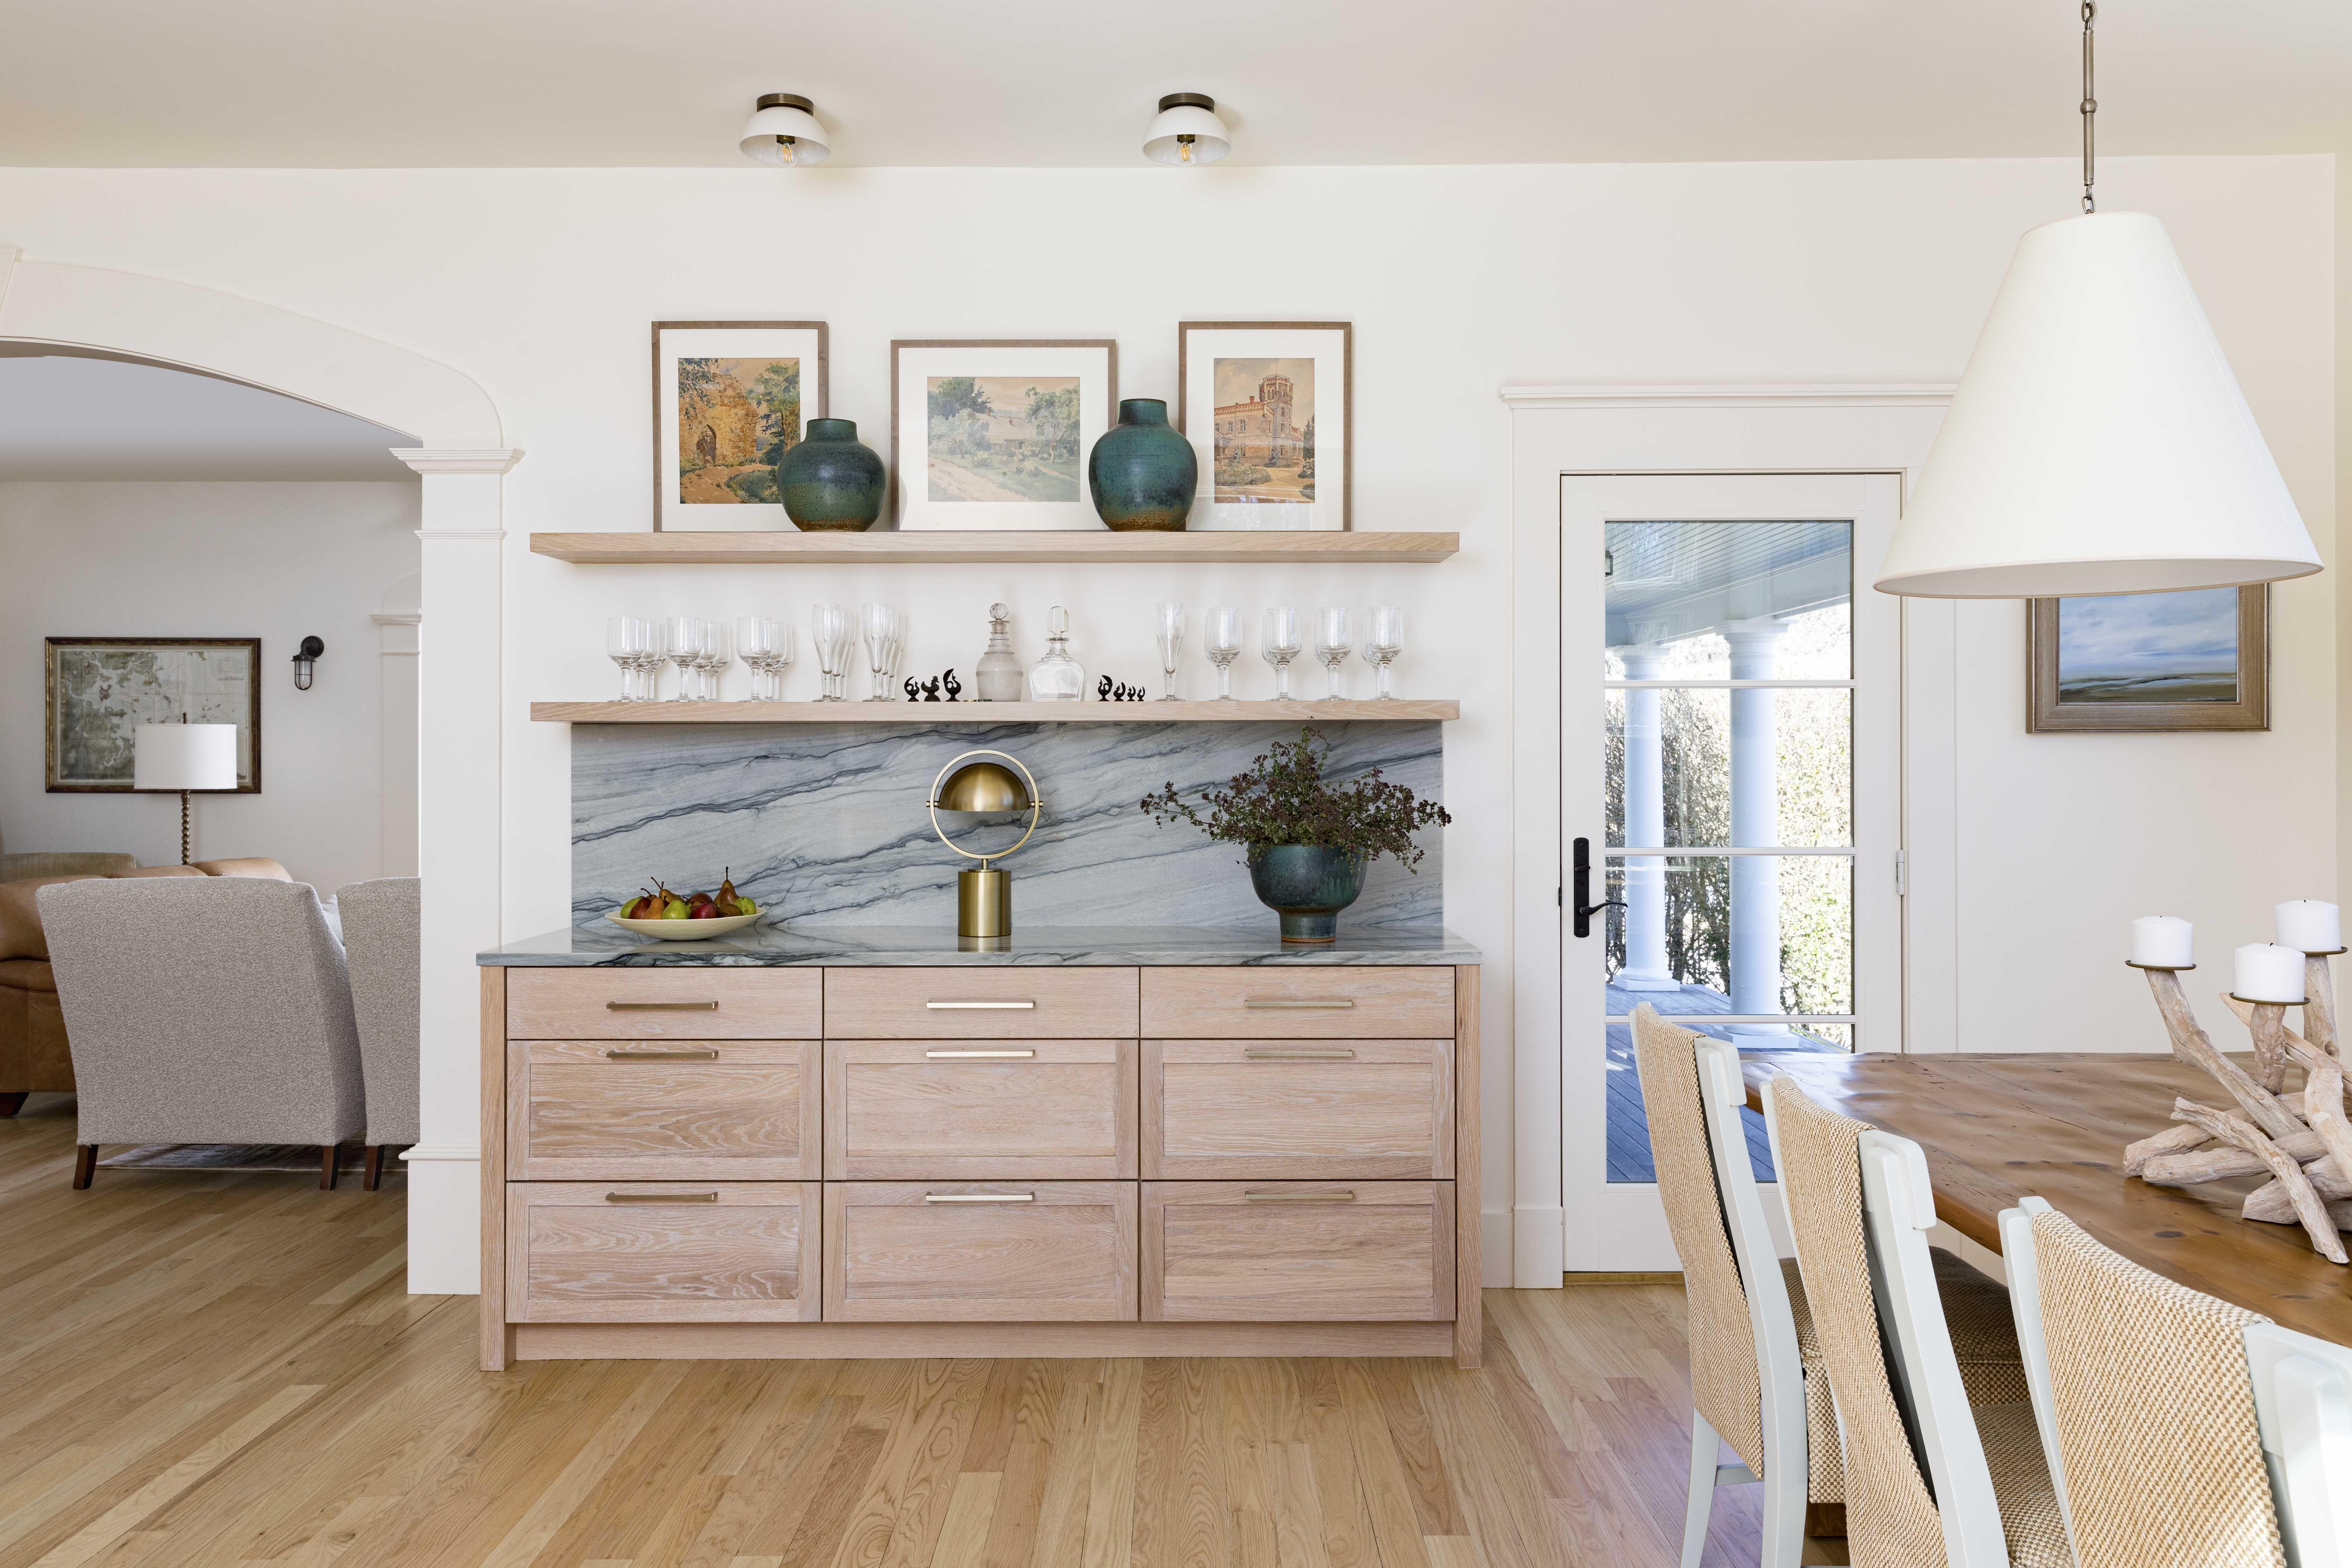 kitchen, serving sideboard, natural wooden cabinets